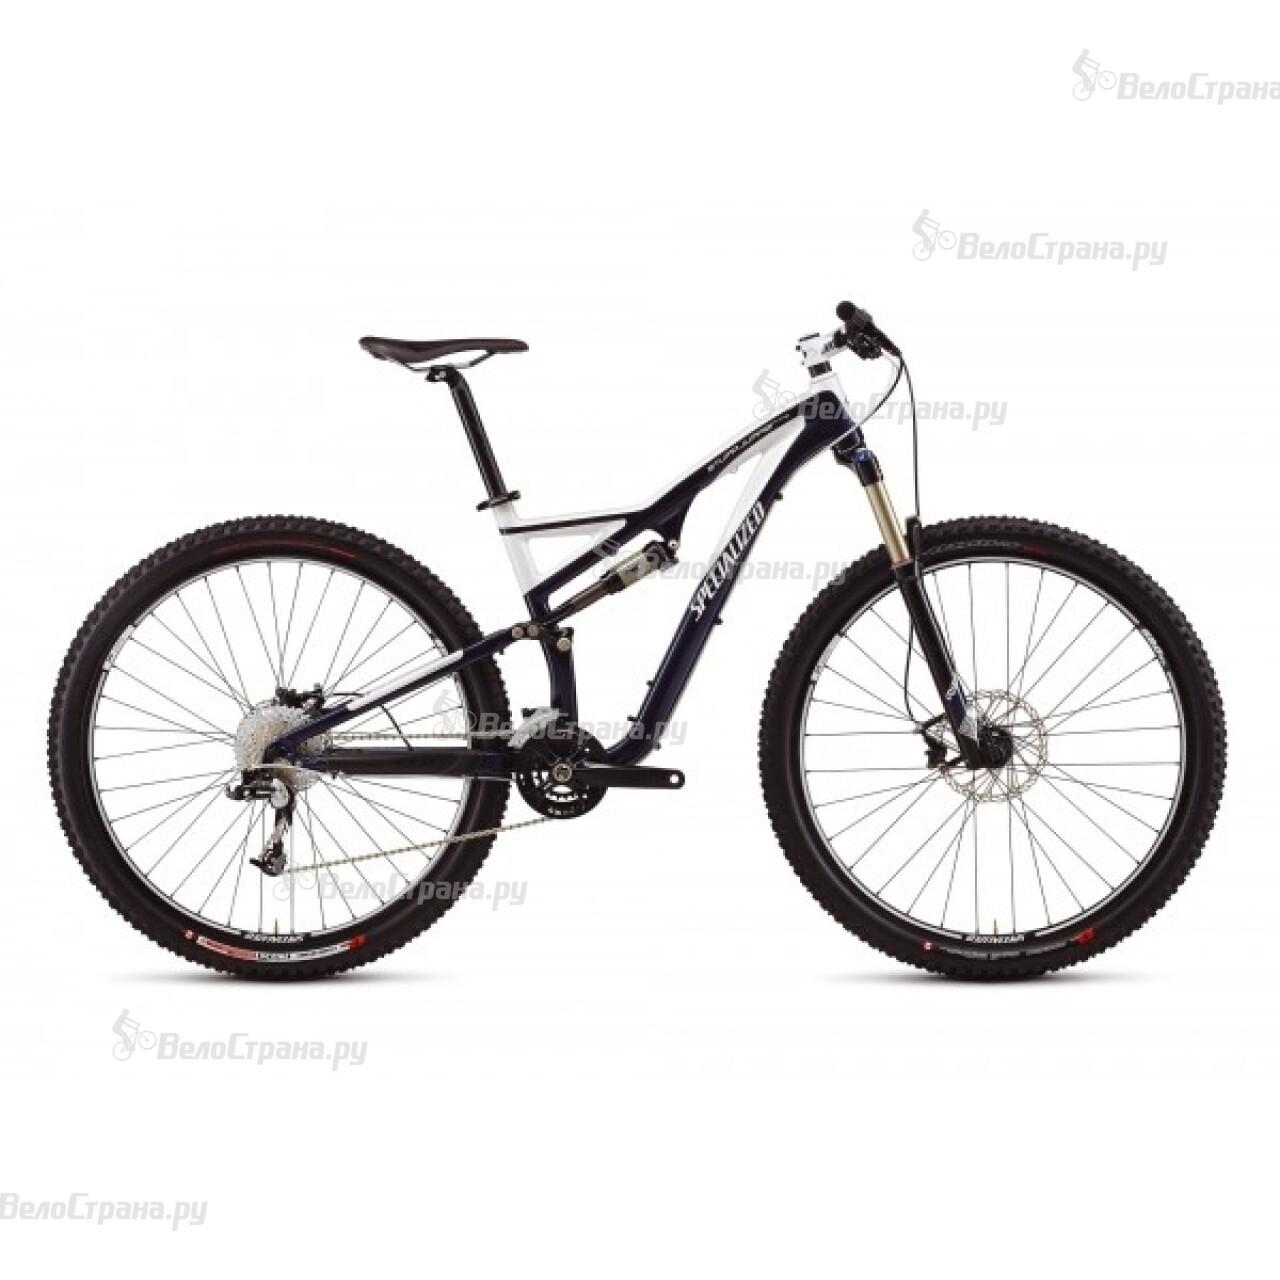 Велосипед Specialized STUMPJUMPER FSR COMP 29 (2013) велосипед specialized stumpjumper fsr comp evo 2013